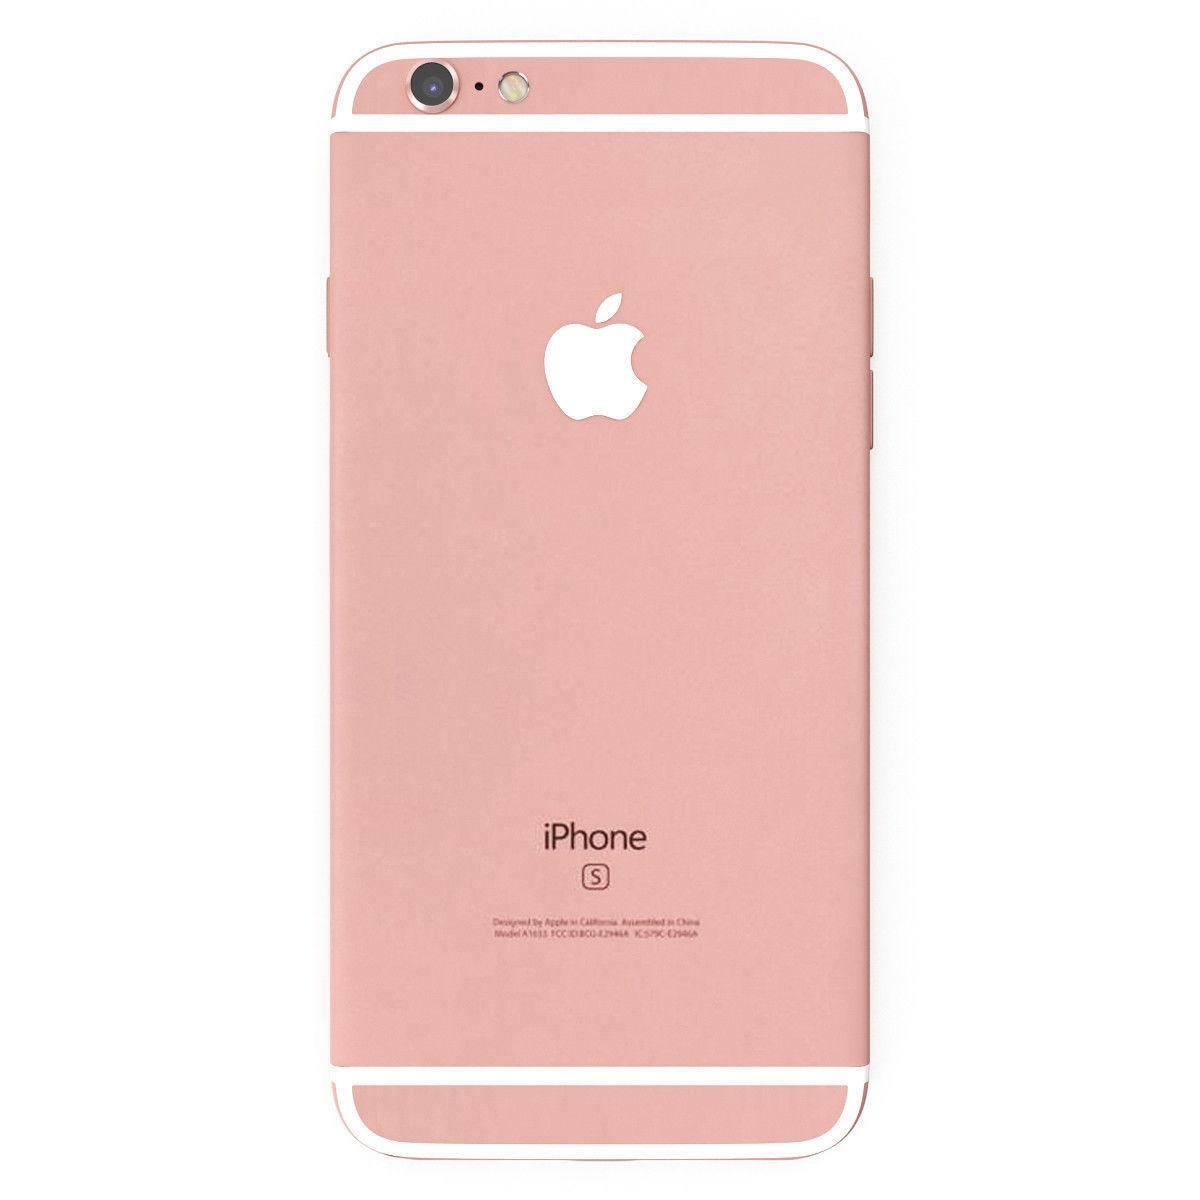 Iphone 6s rose gold price  Teurer Schmuck